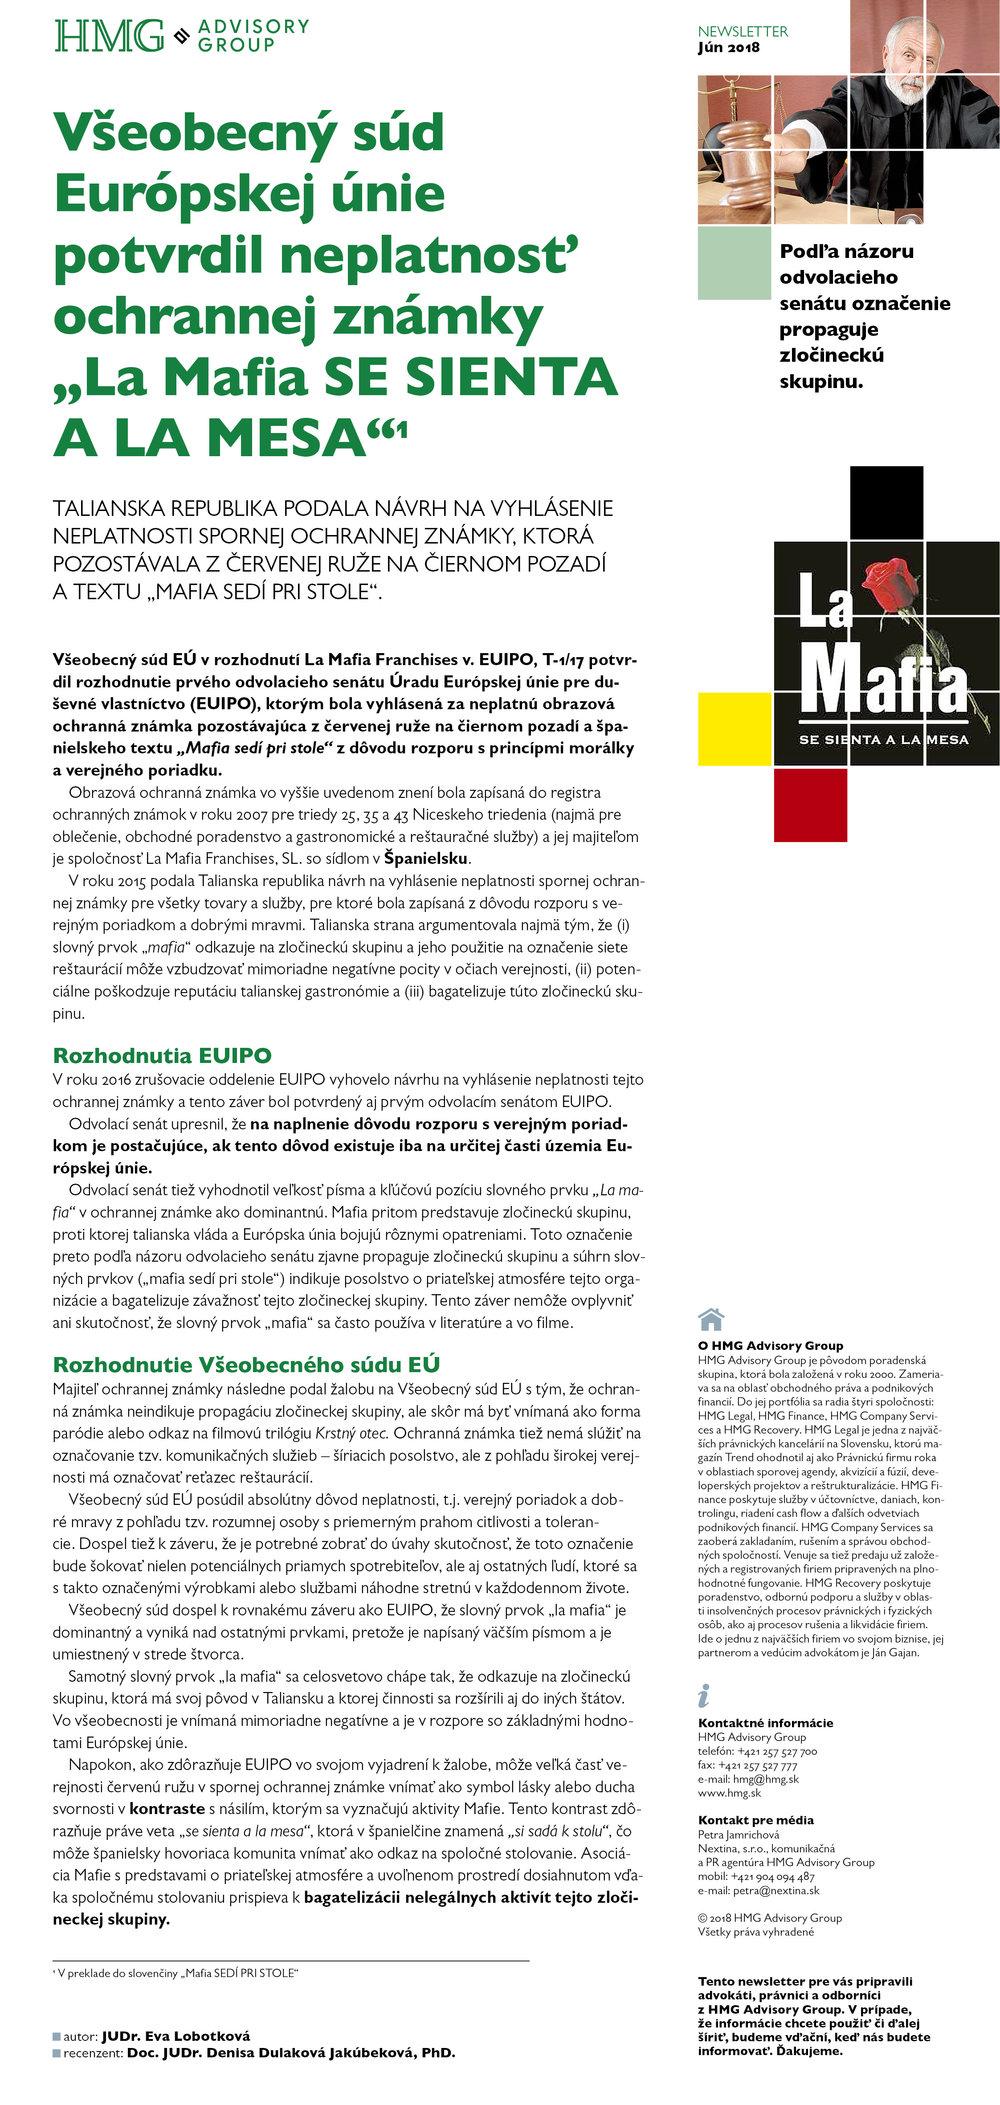 HMG_newsletter_la mafia1.jpg